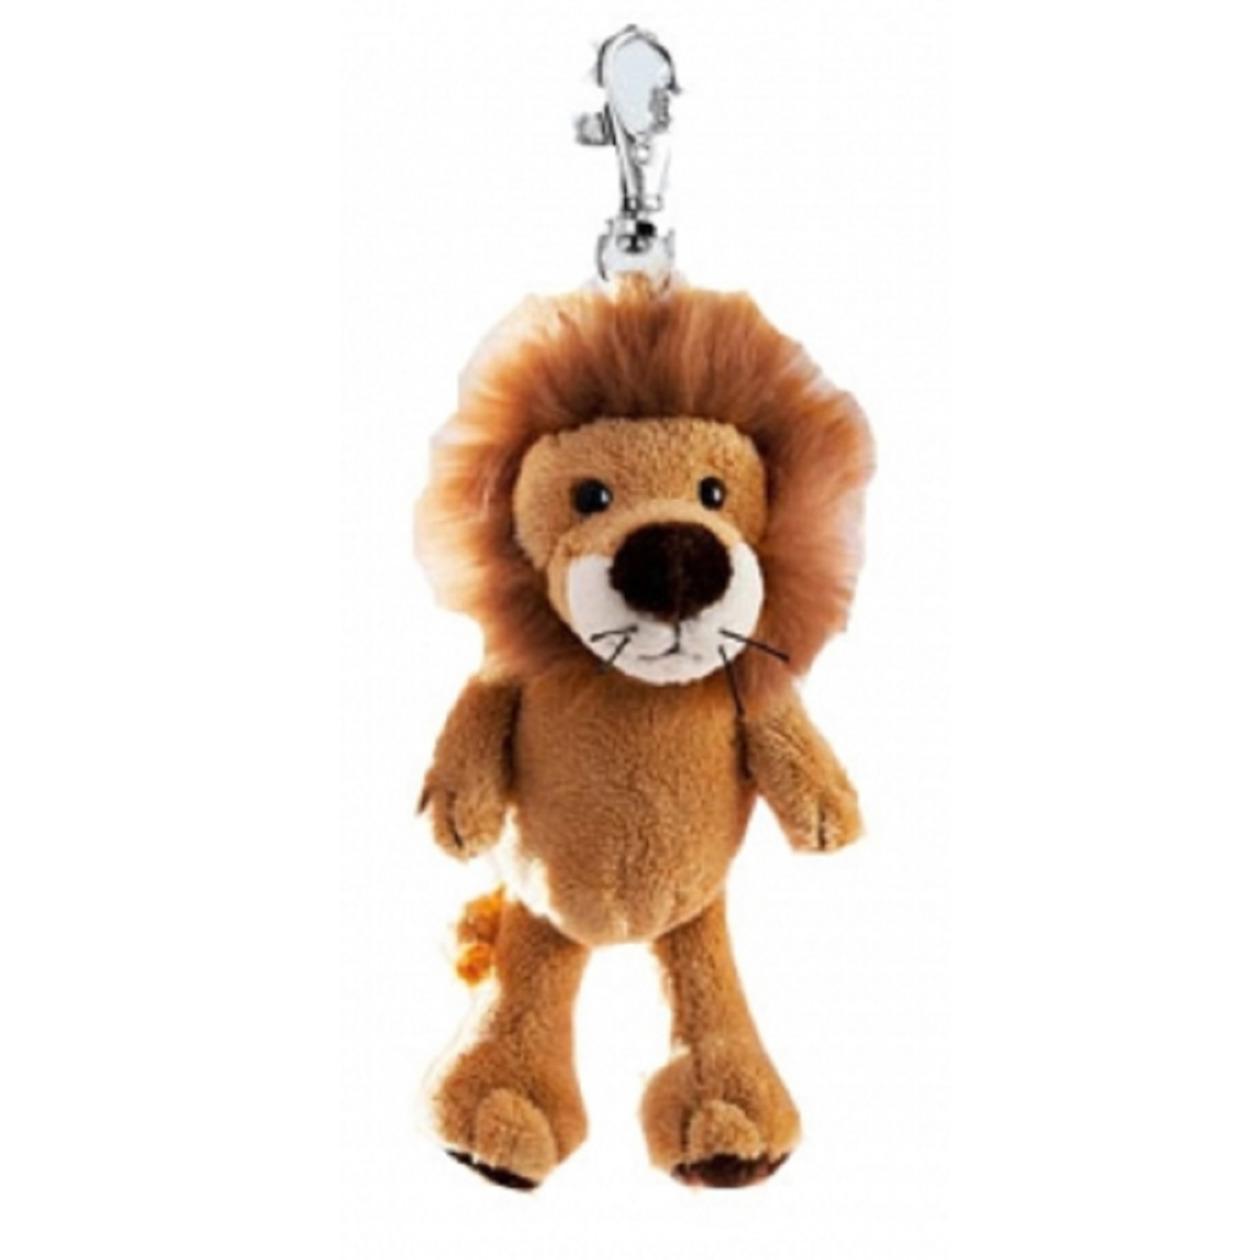 Pluche mini leeuw knuffel sleutelhanger 10 cm